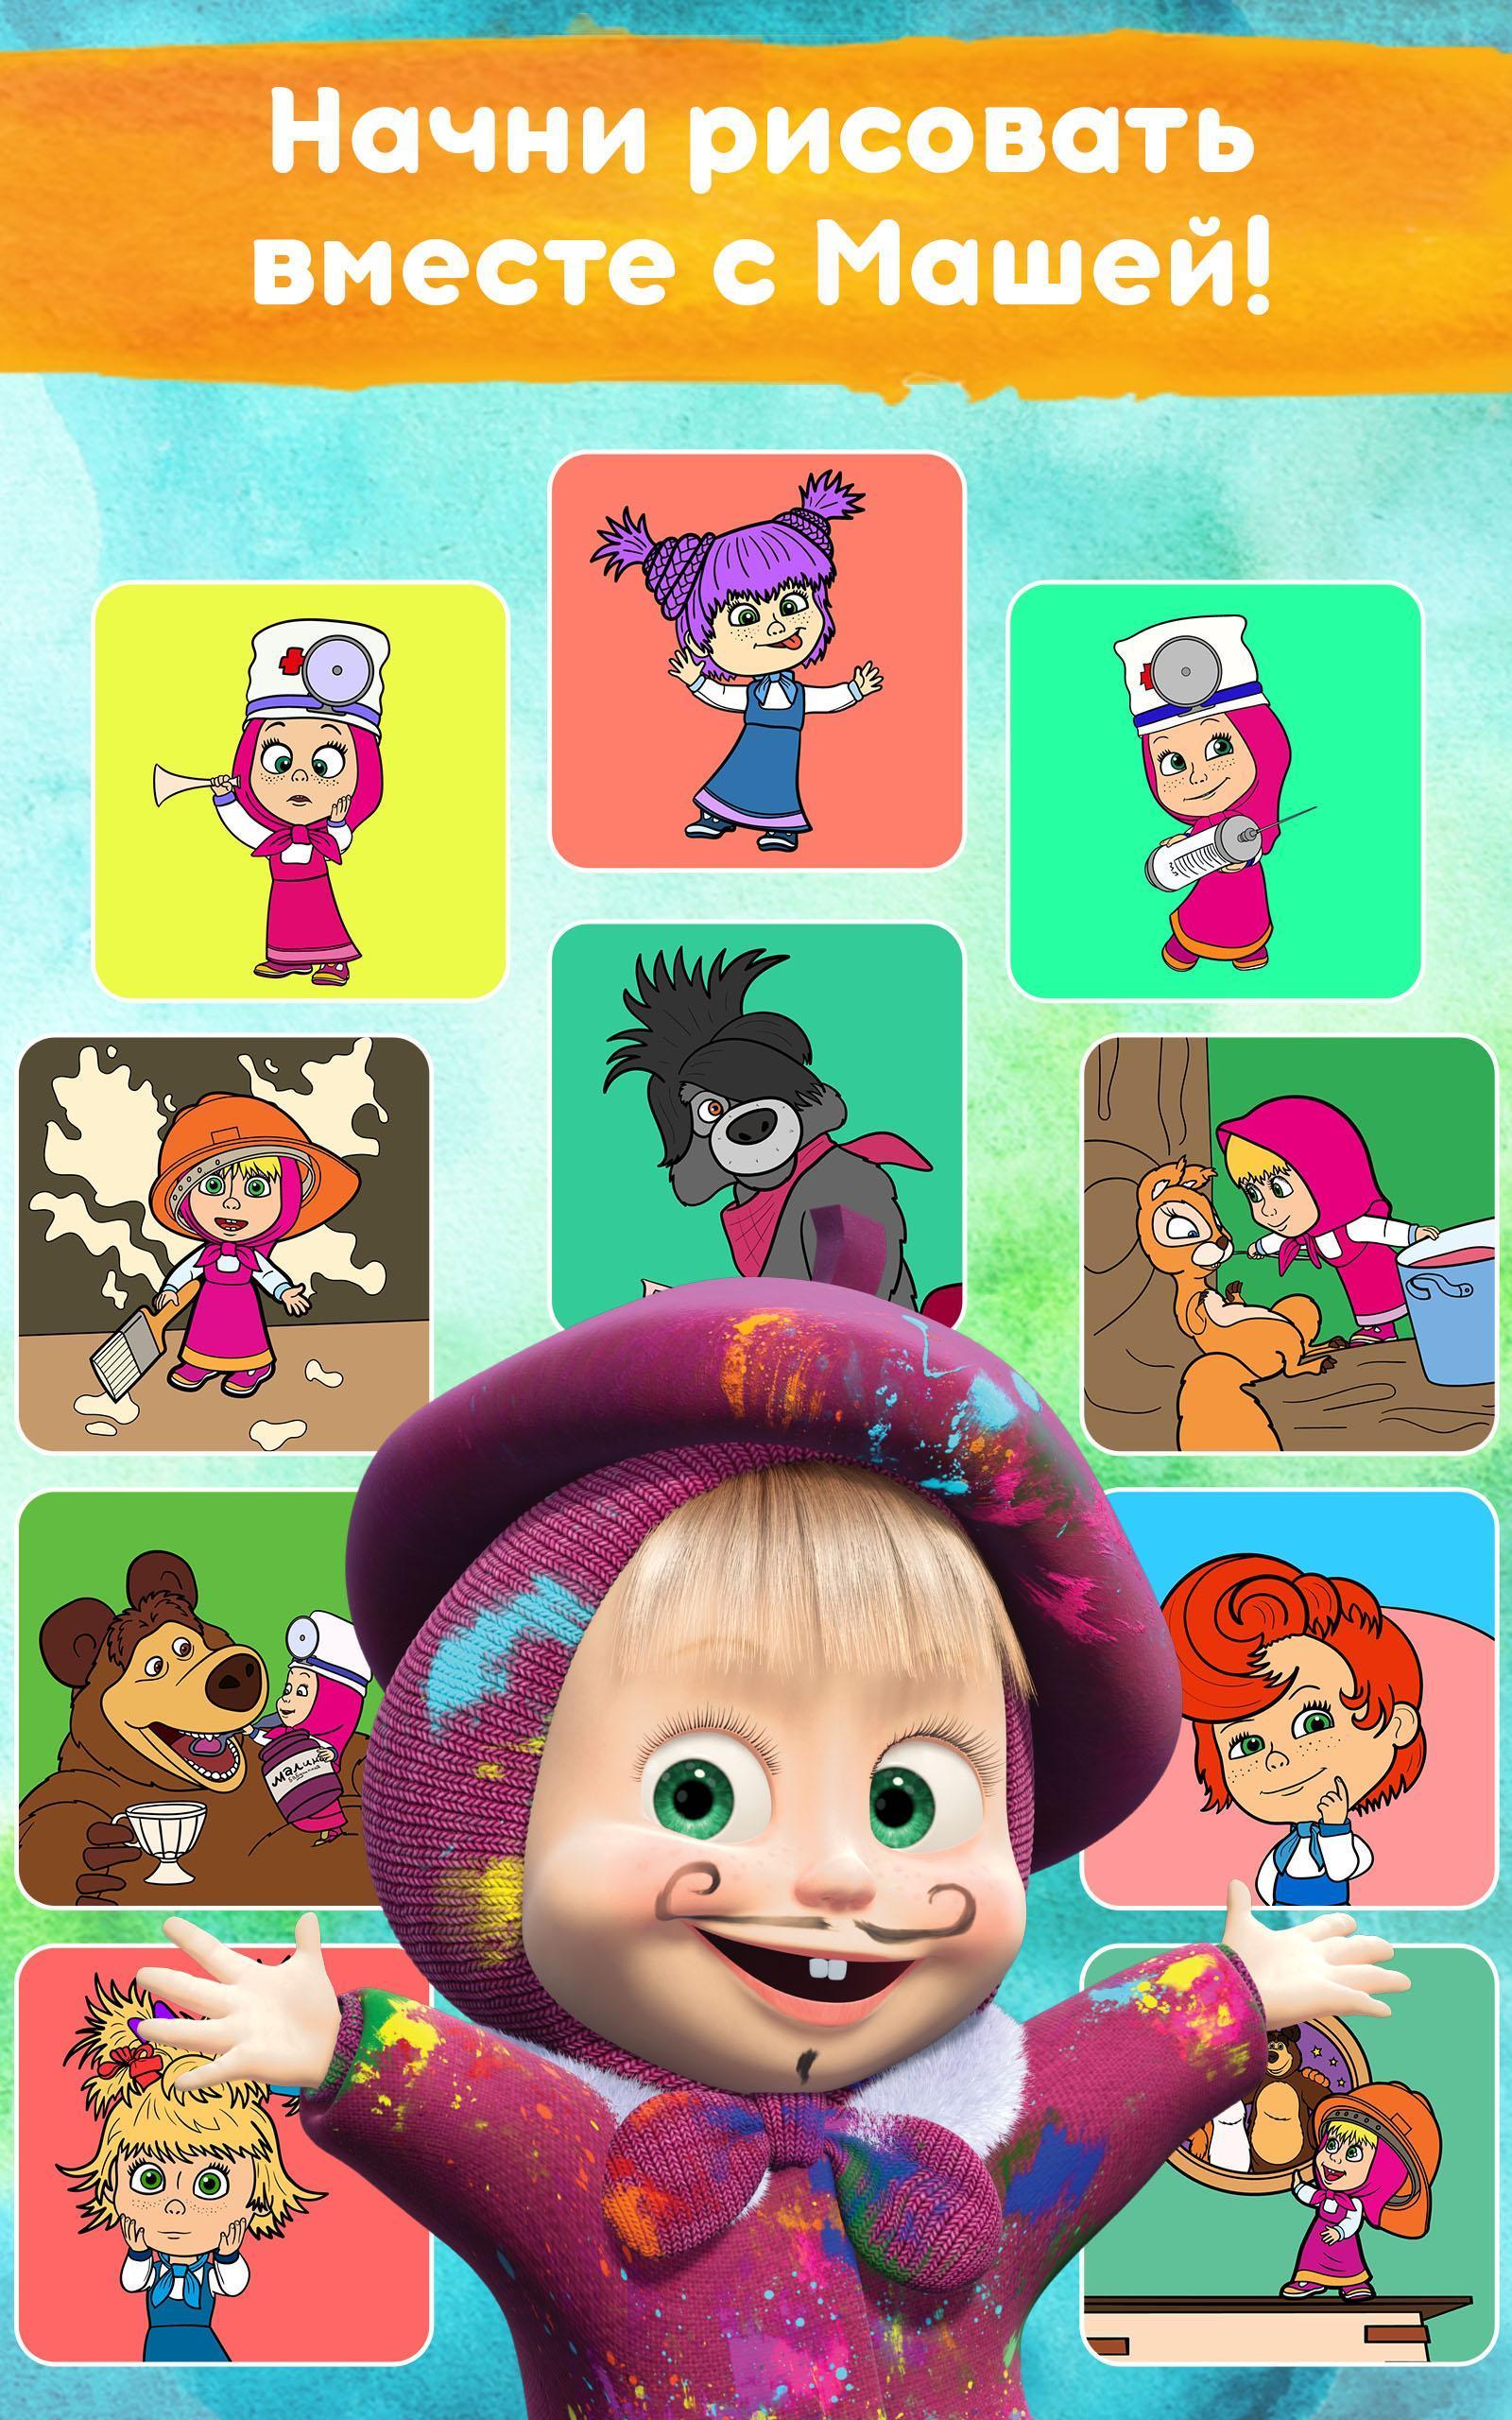 Раскраски онлайн | Развитие детей. Онлайн игры. Сказки. Раскраски. Алфавит.  Карточки. Математика. Здоровье. | 2560x1600